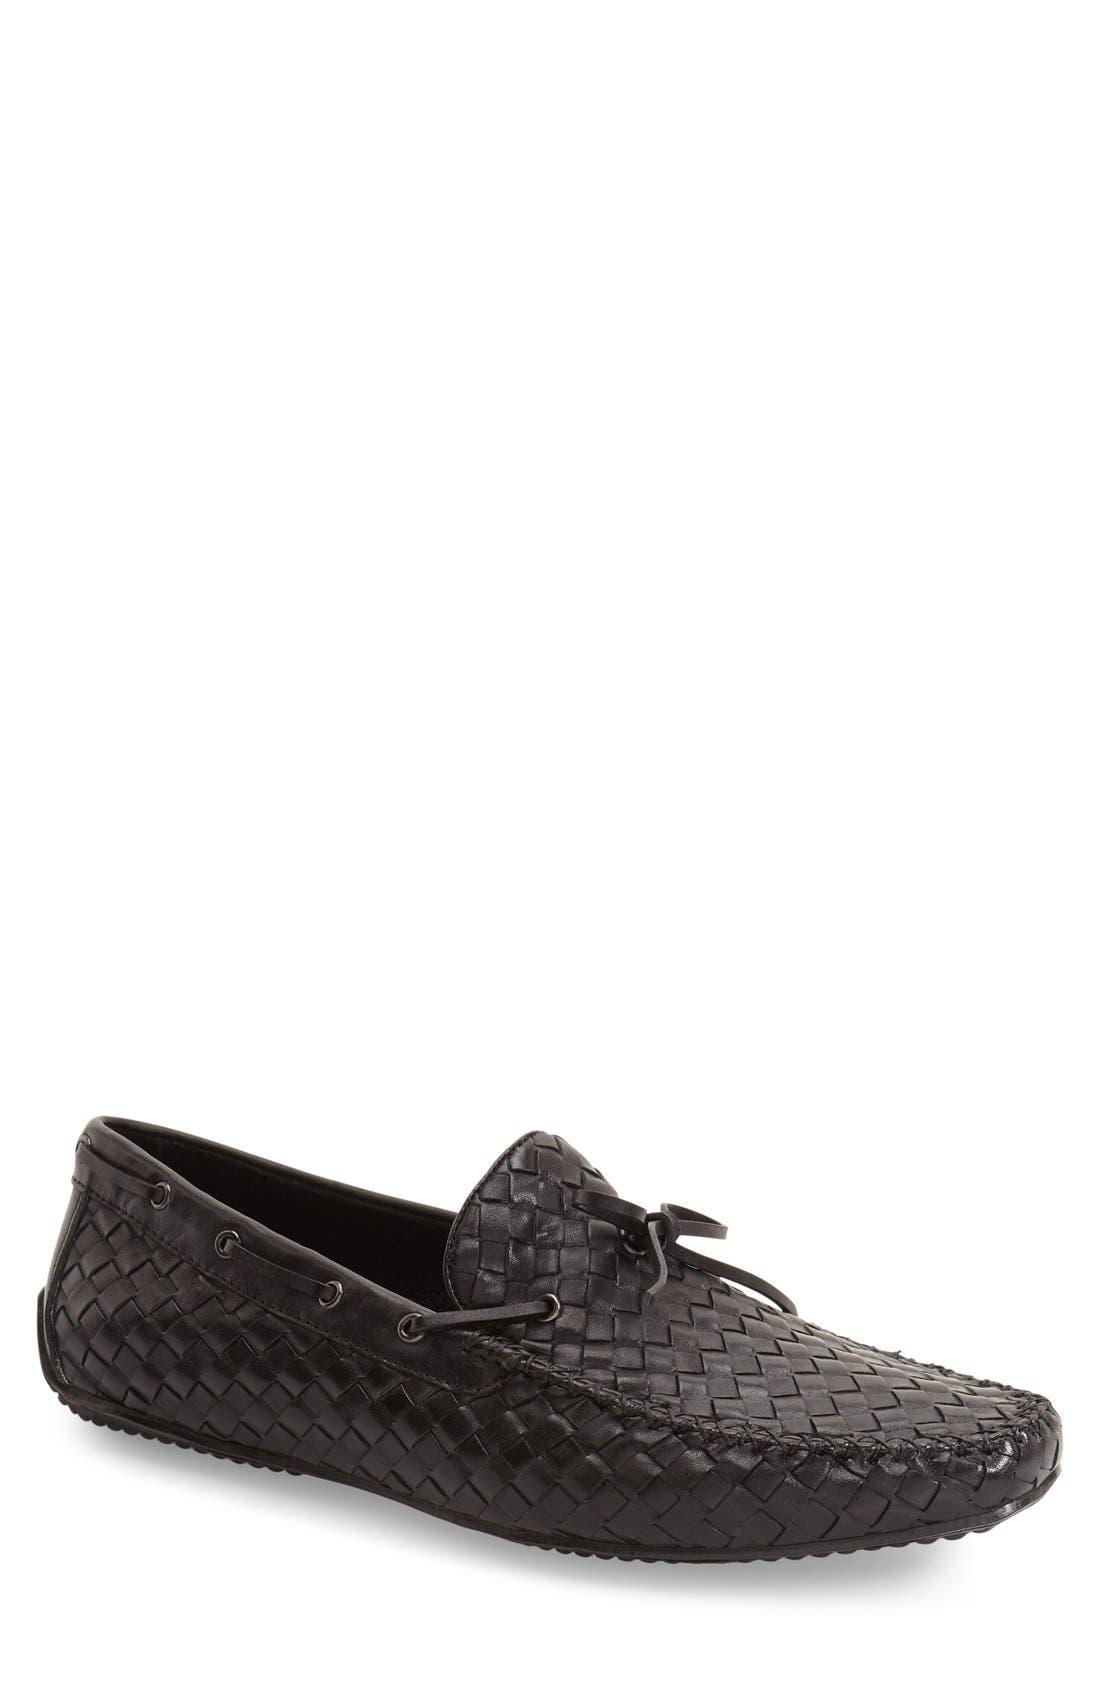 Zanzara Leather Loafer- Black